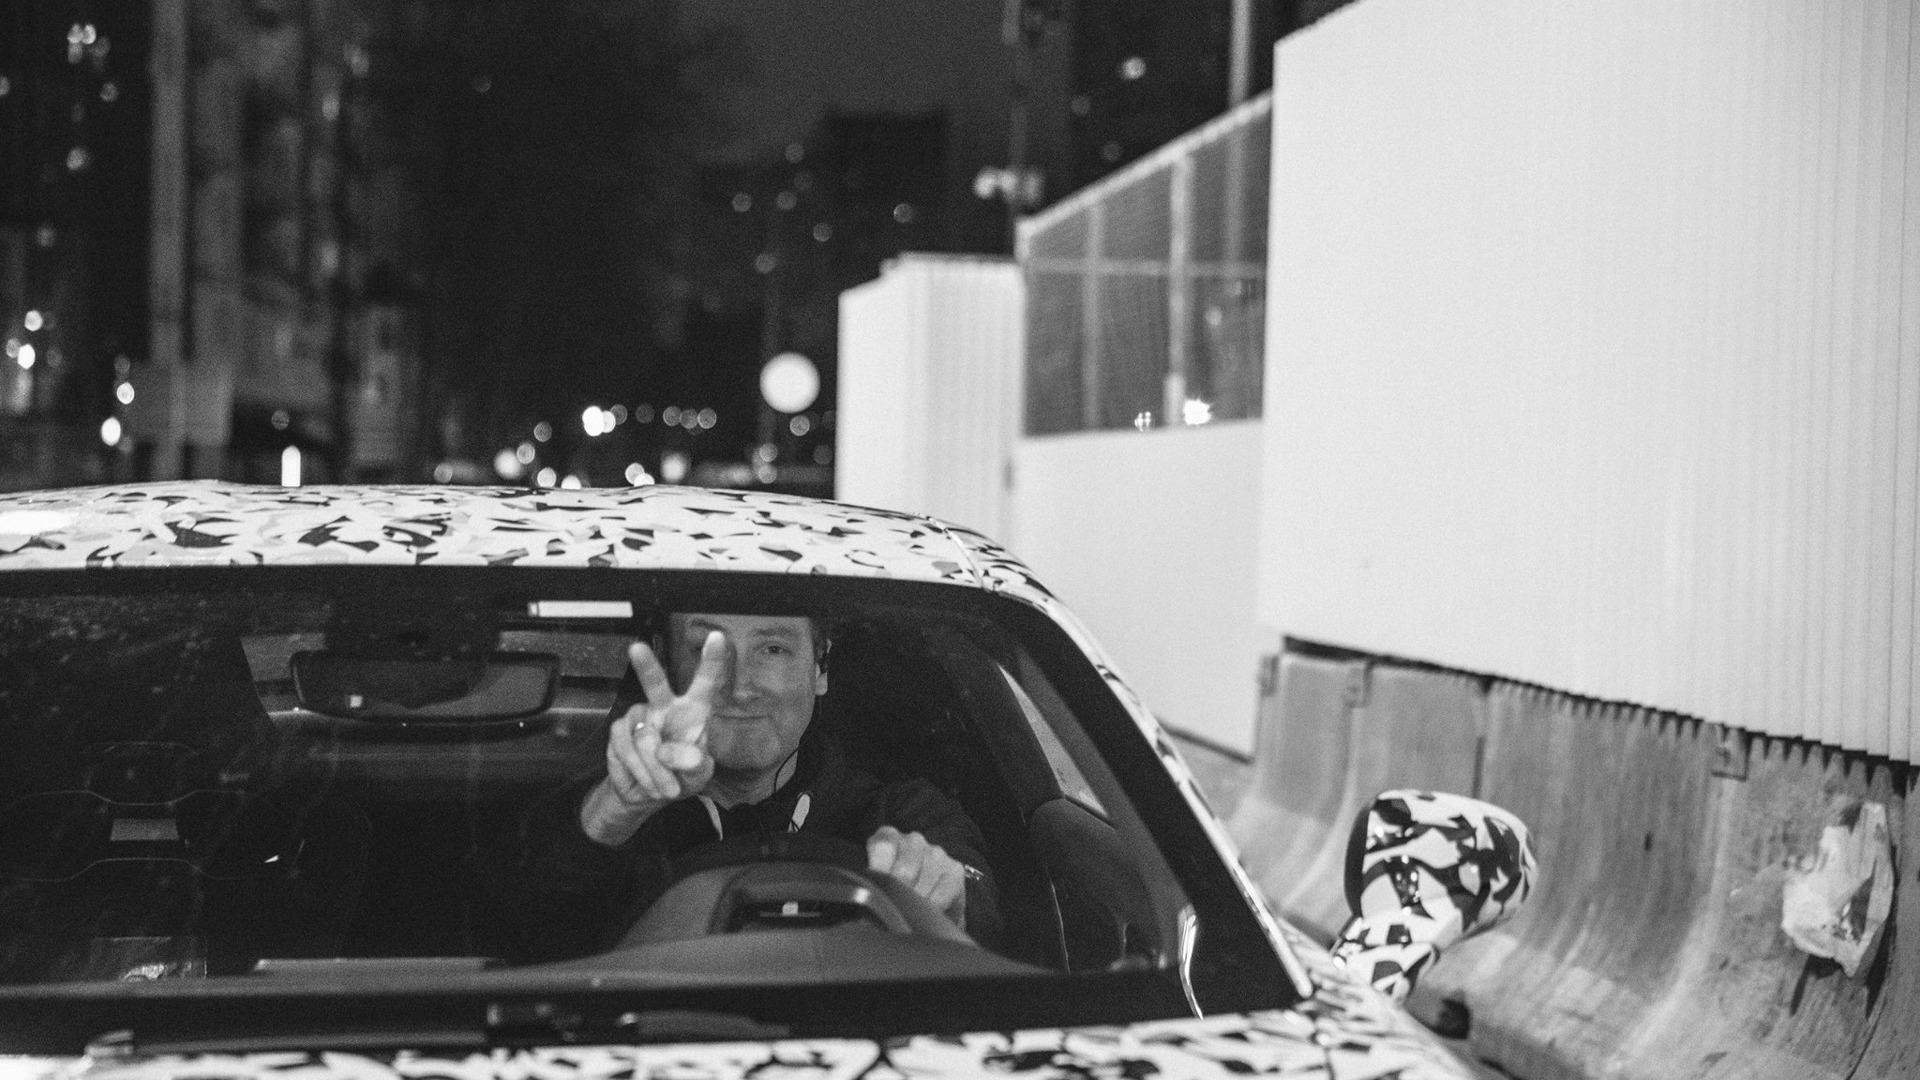 alpine-prototypes-paris-night-ride (14)